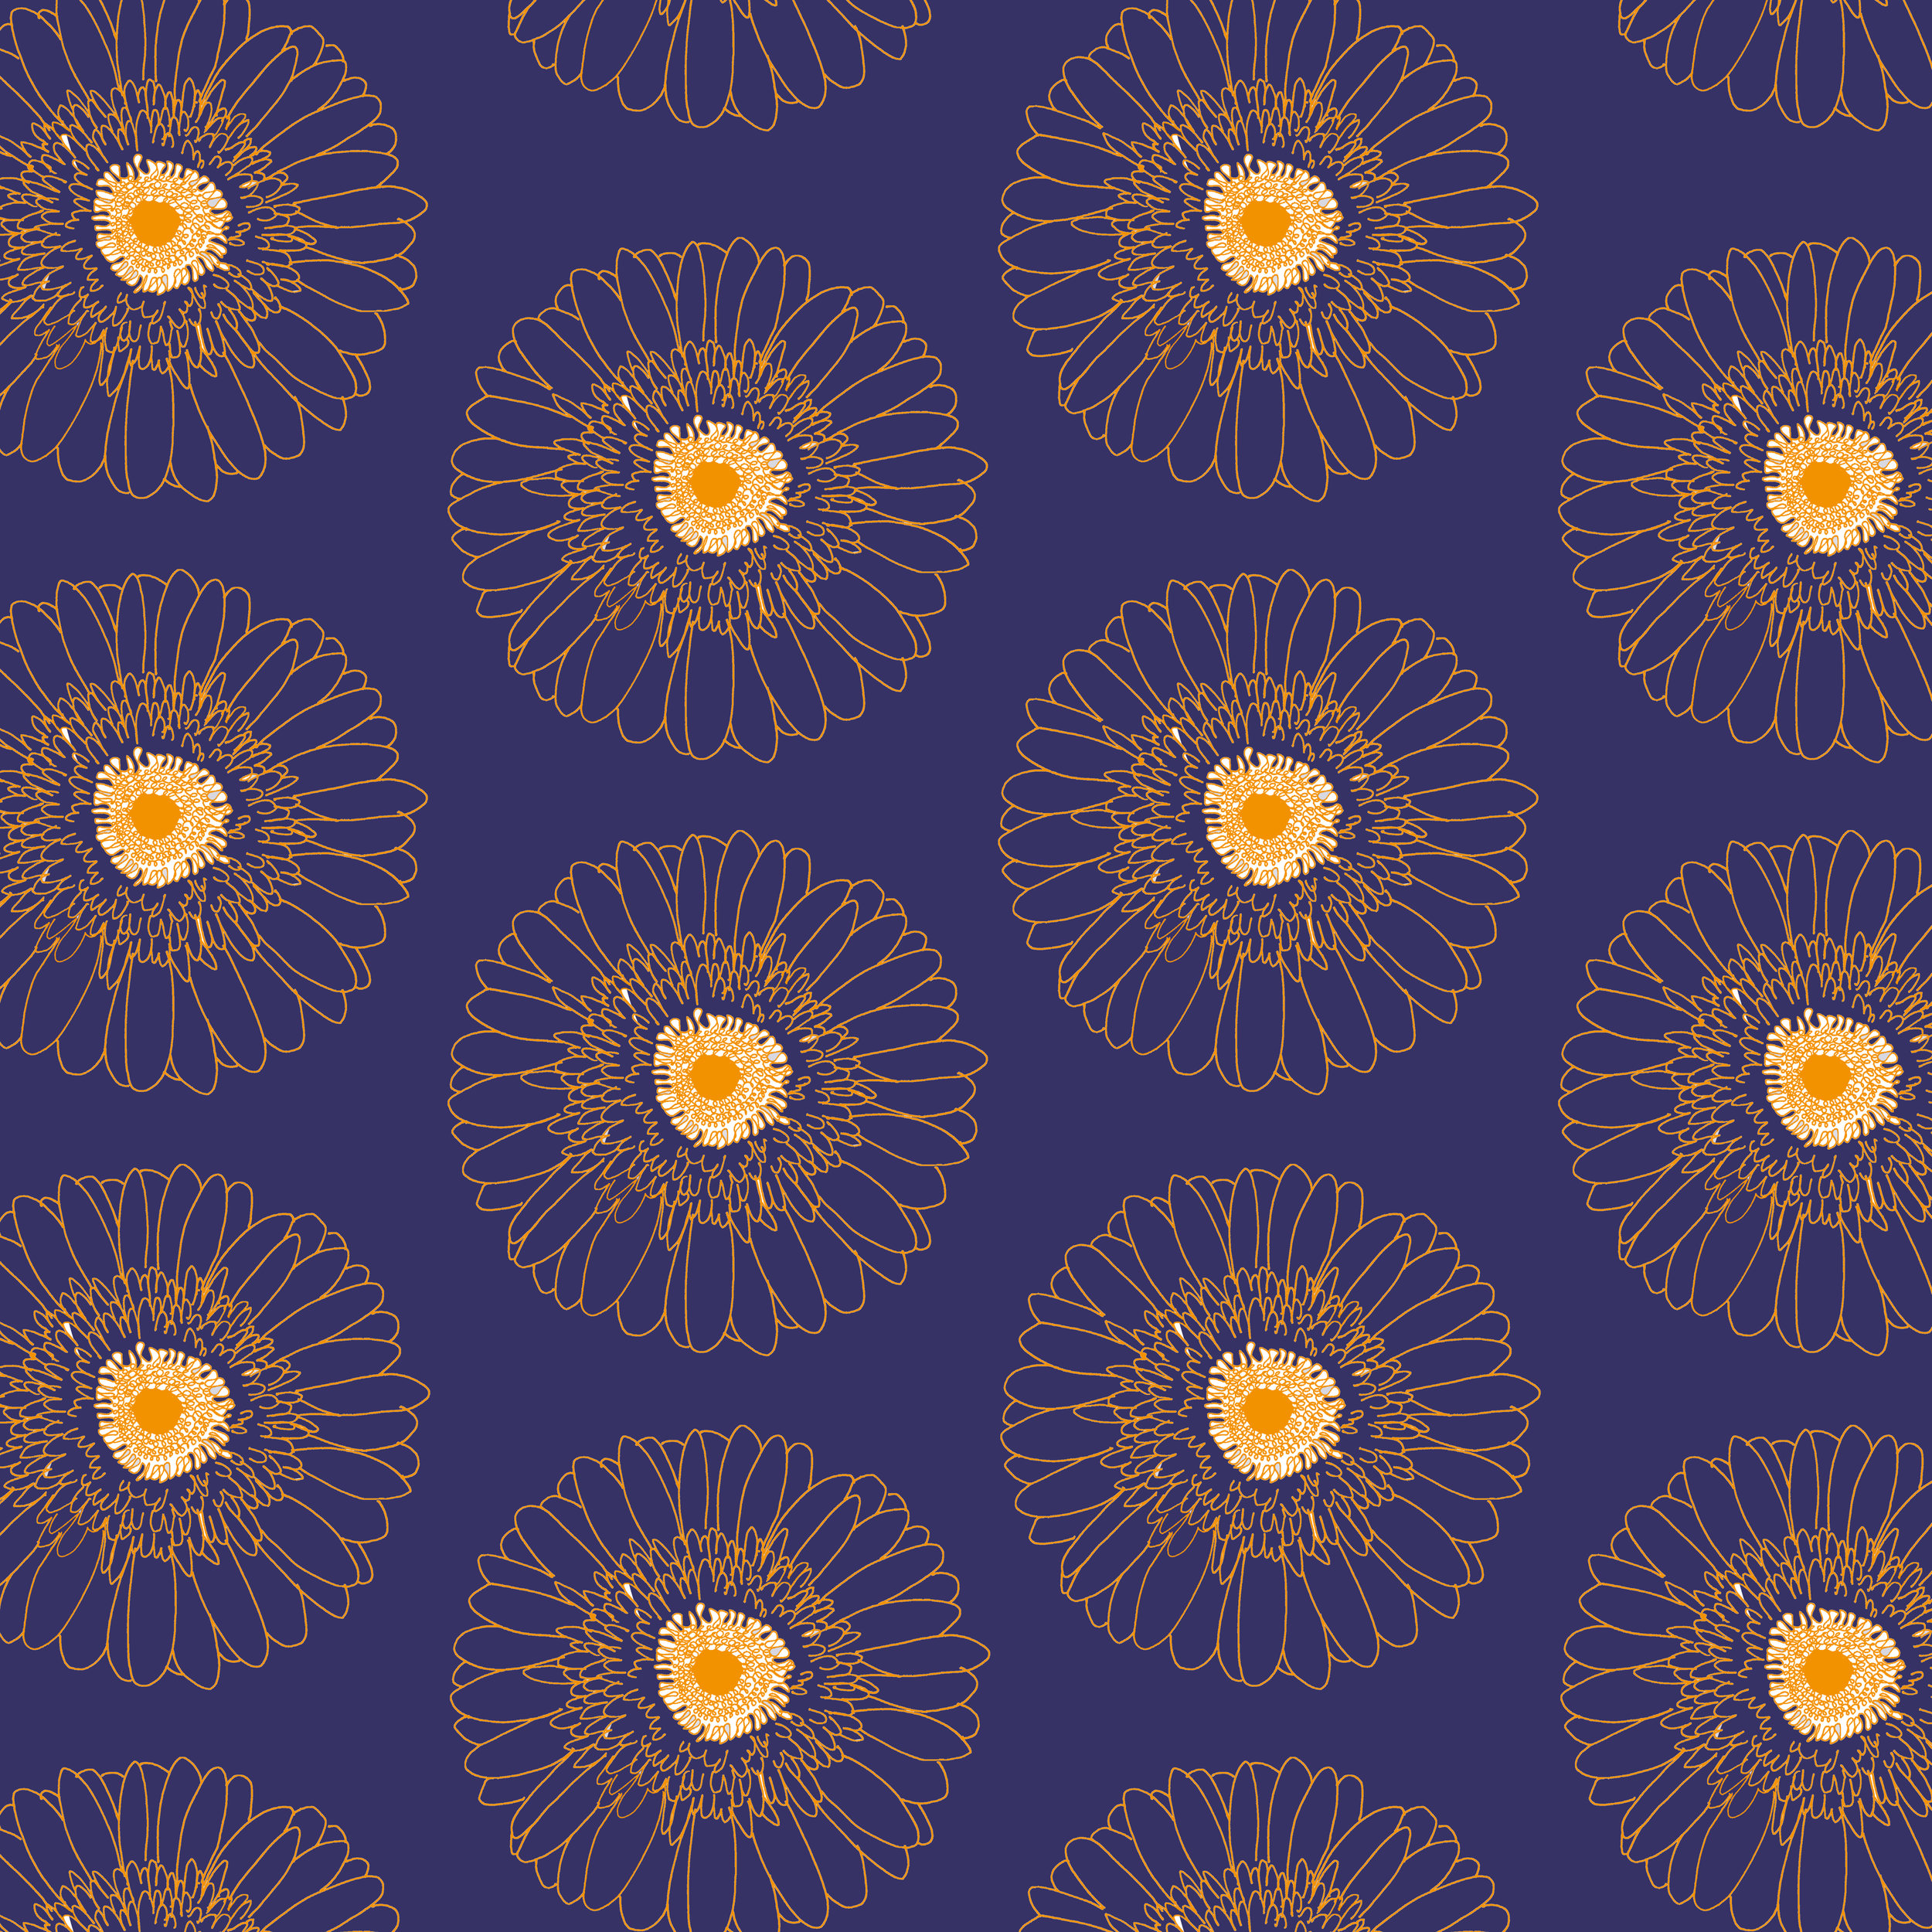 Bright Blooms 3_edited-1.jpg